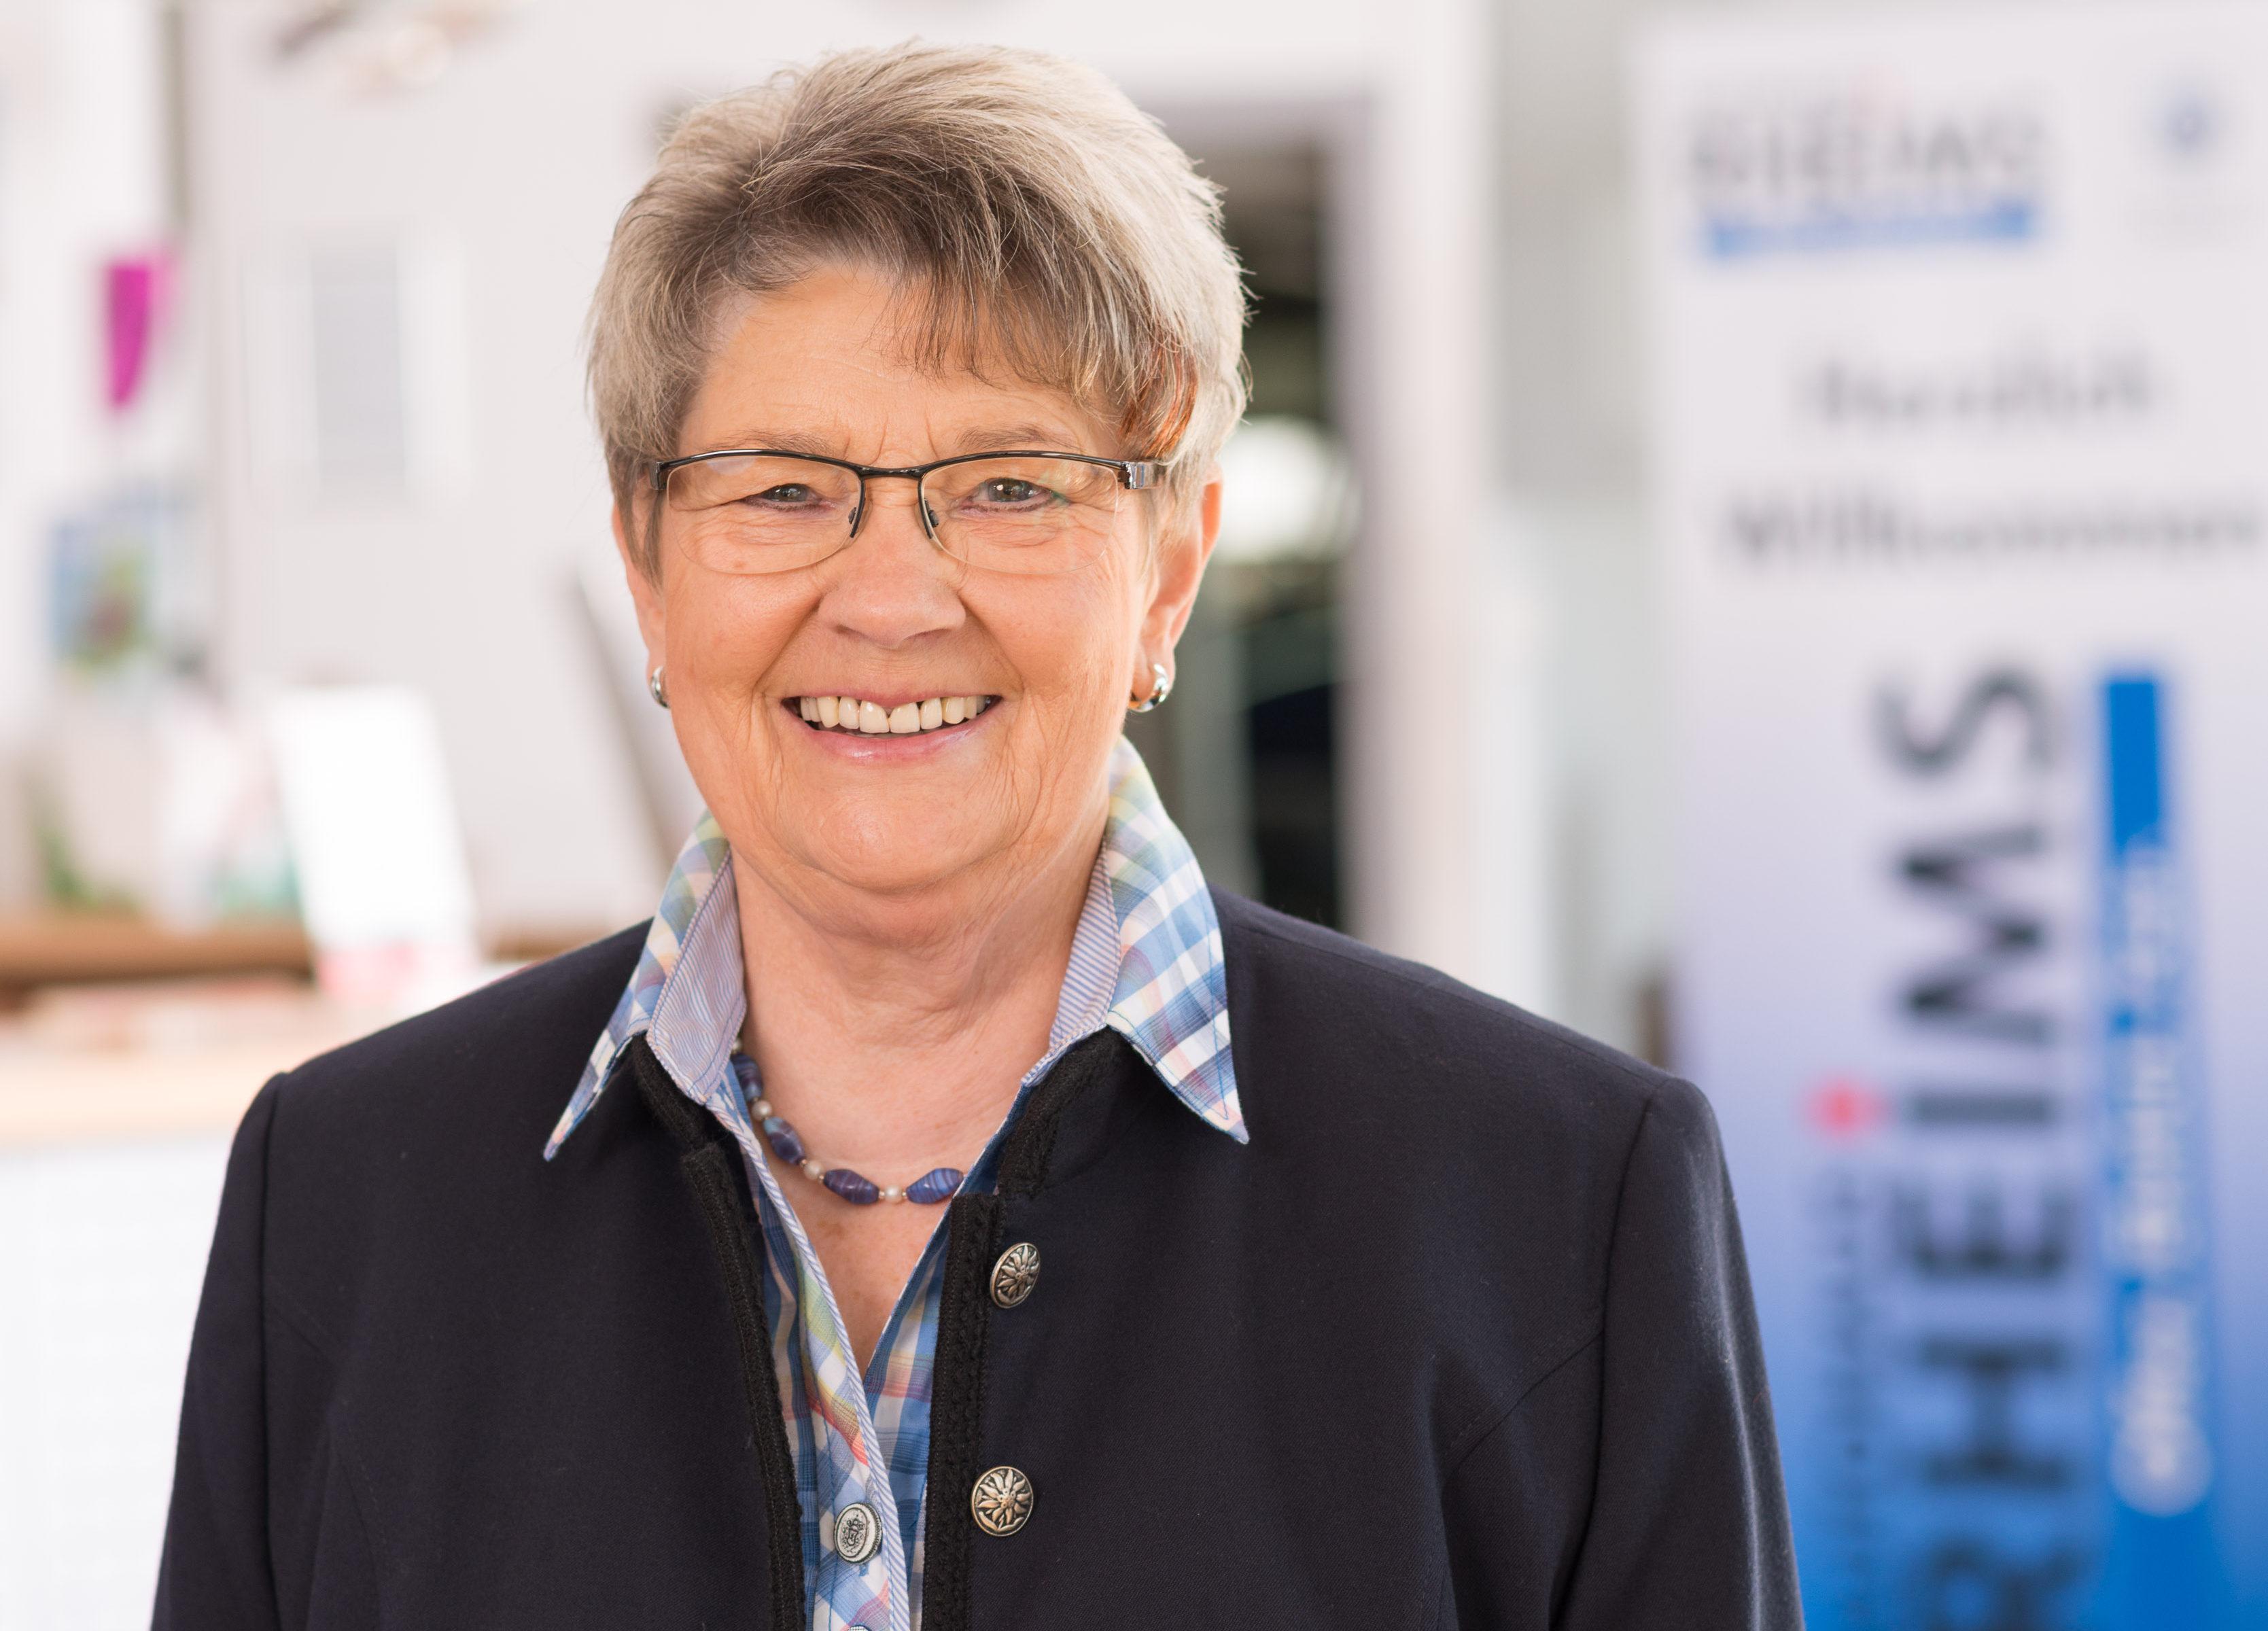 Sonja Schmitz